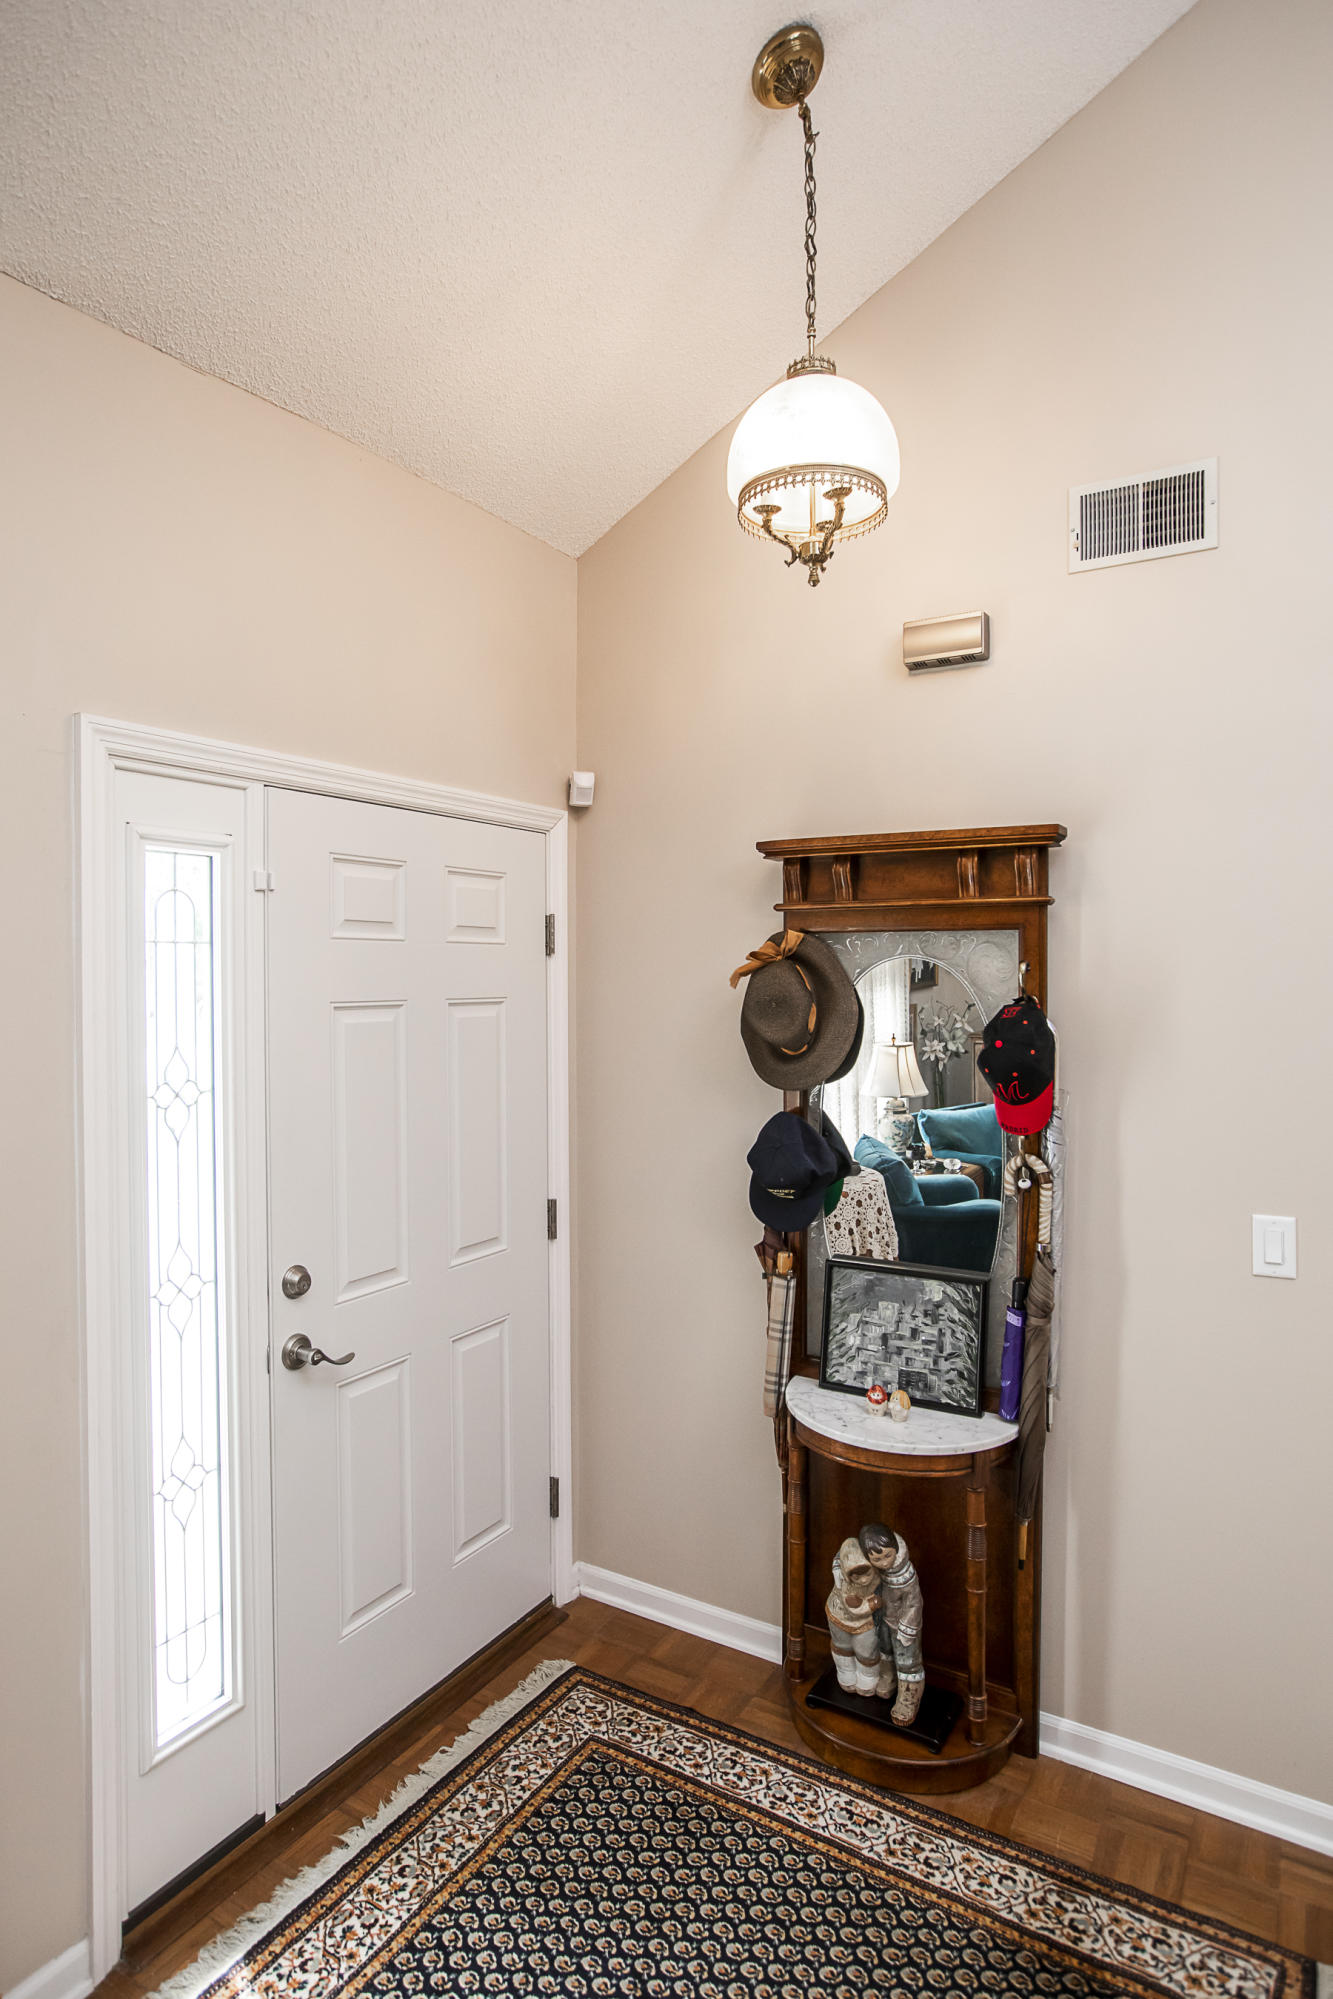 Crown Pointe Homes For Sale - 1439 Diamond, Mount Pleasant, SC - 5